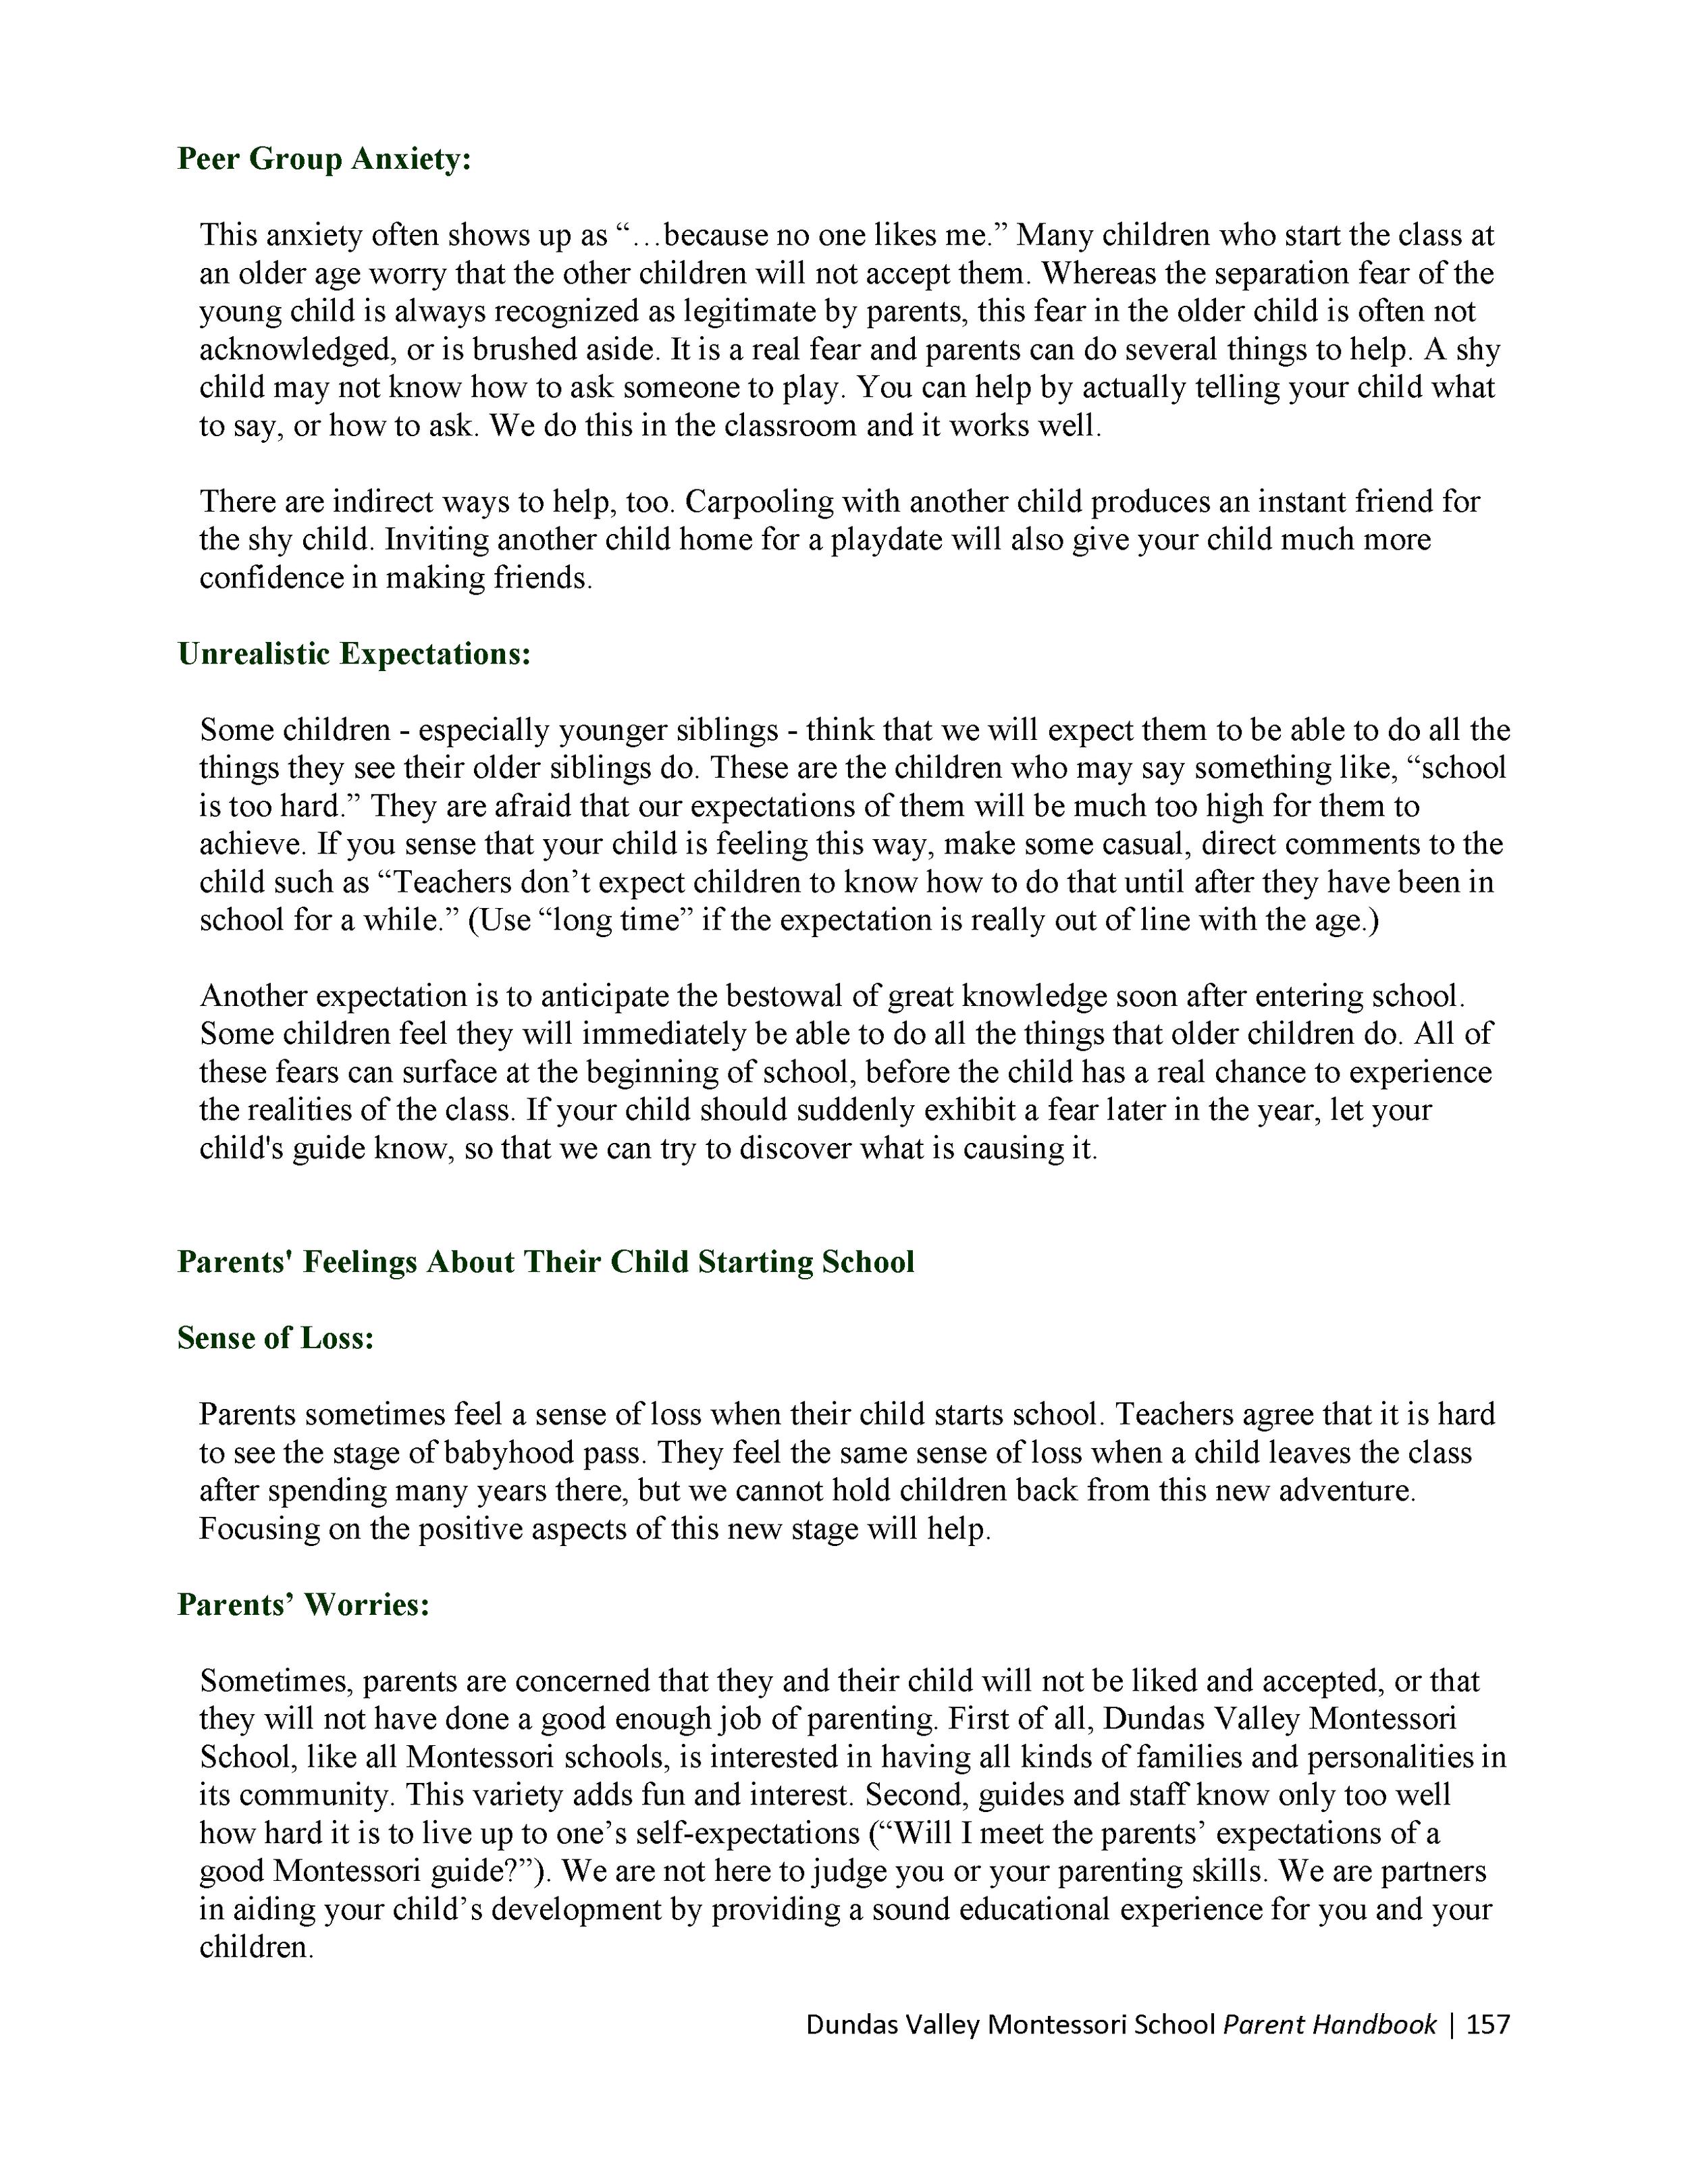 DVMS-Parent-Handbook-19-20_Page_159.png